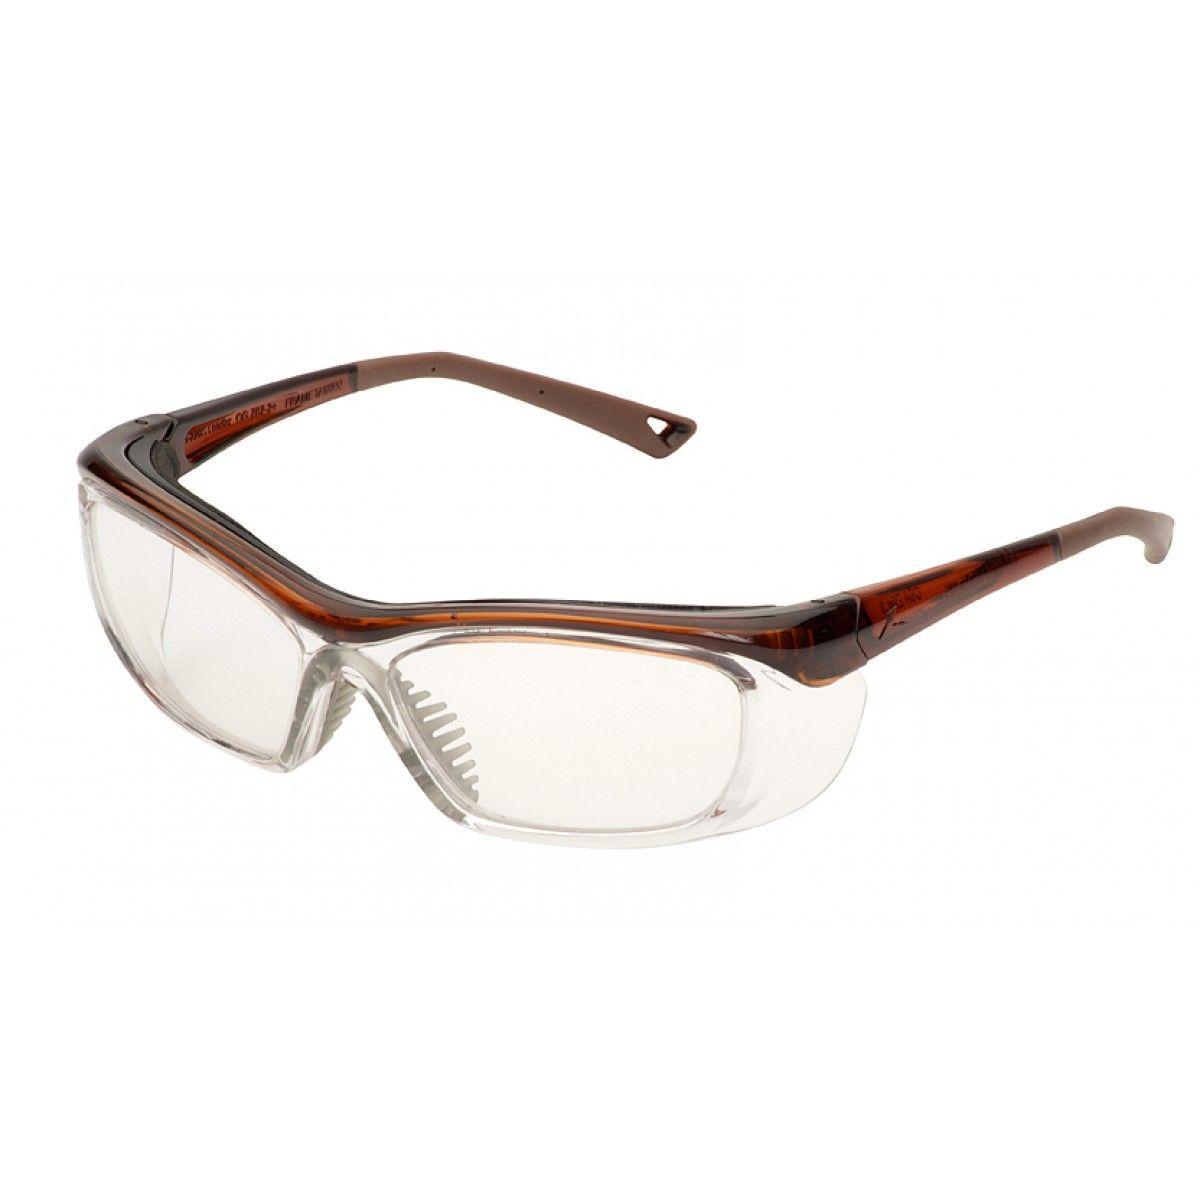 3m safety glasses prescription frames onguard 220s